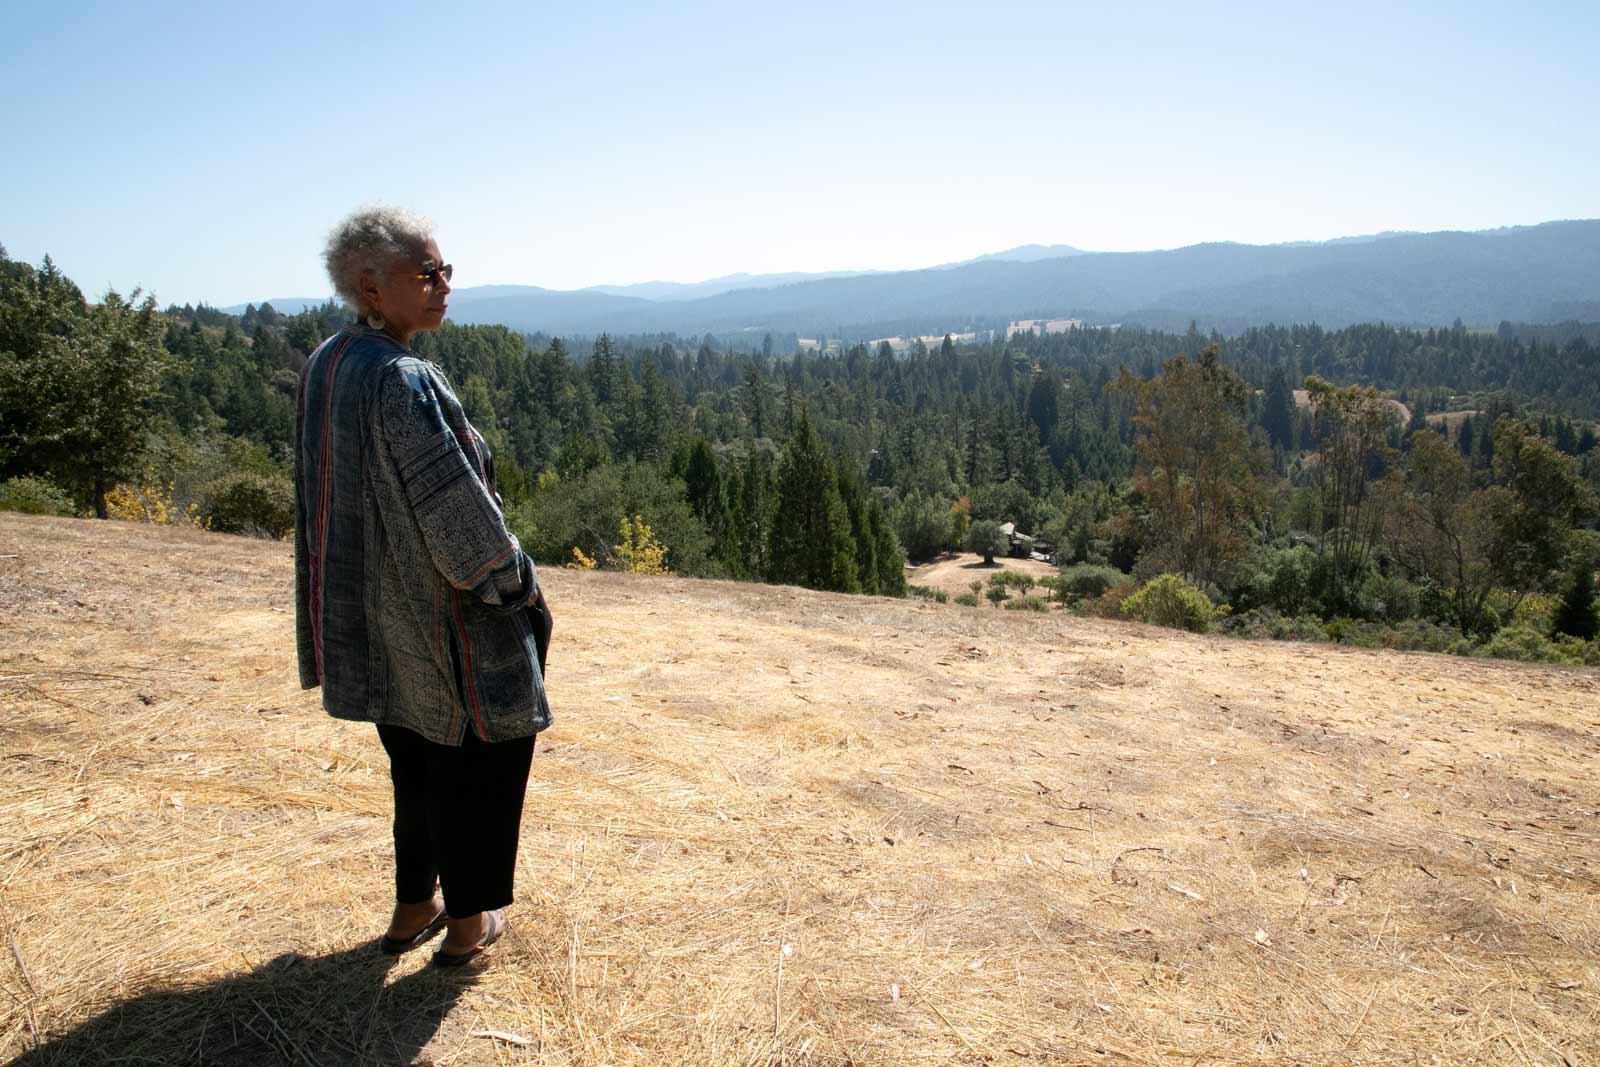 Alice Walker, Mendocino, California, September 17, 2018